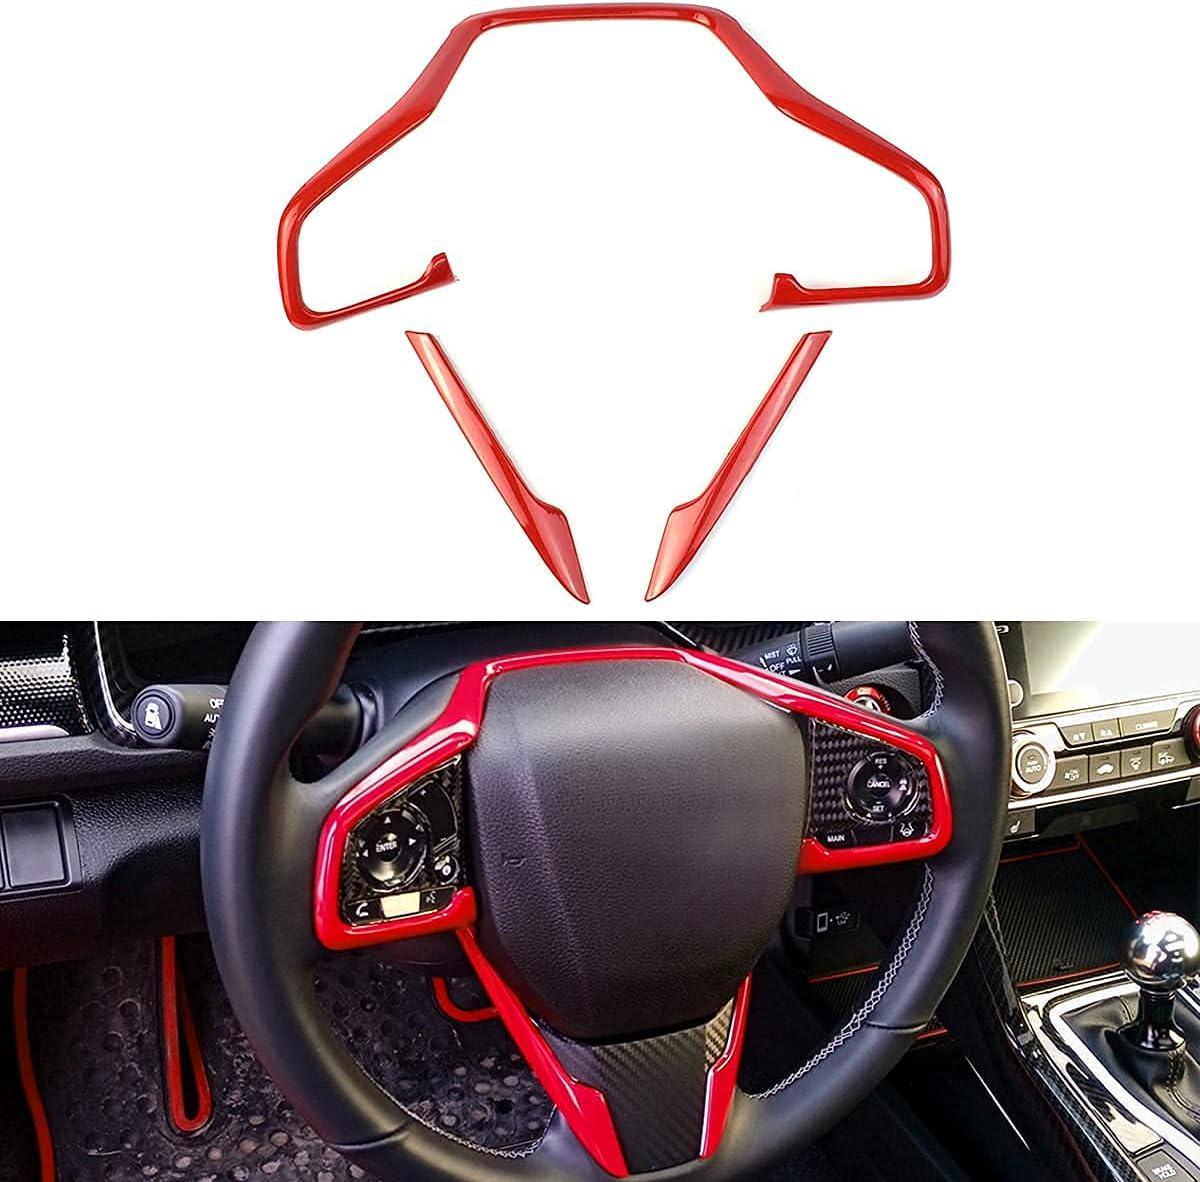 Award-winning store Max 41% OFF Steering Wheel Red Trim Sticker w Compatible Decaration Interior